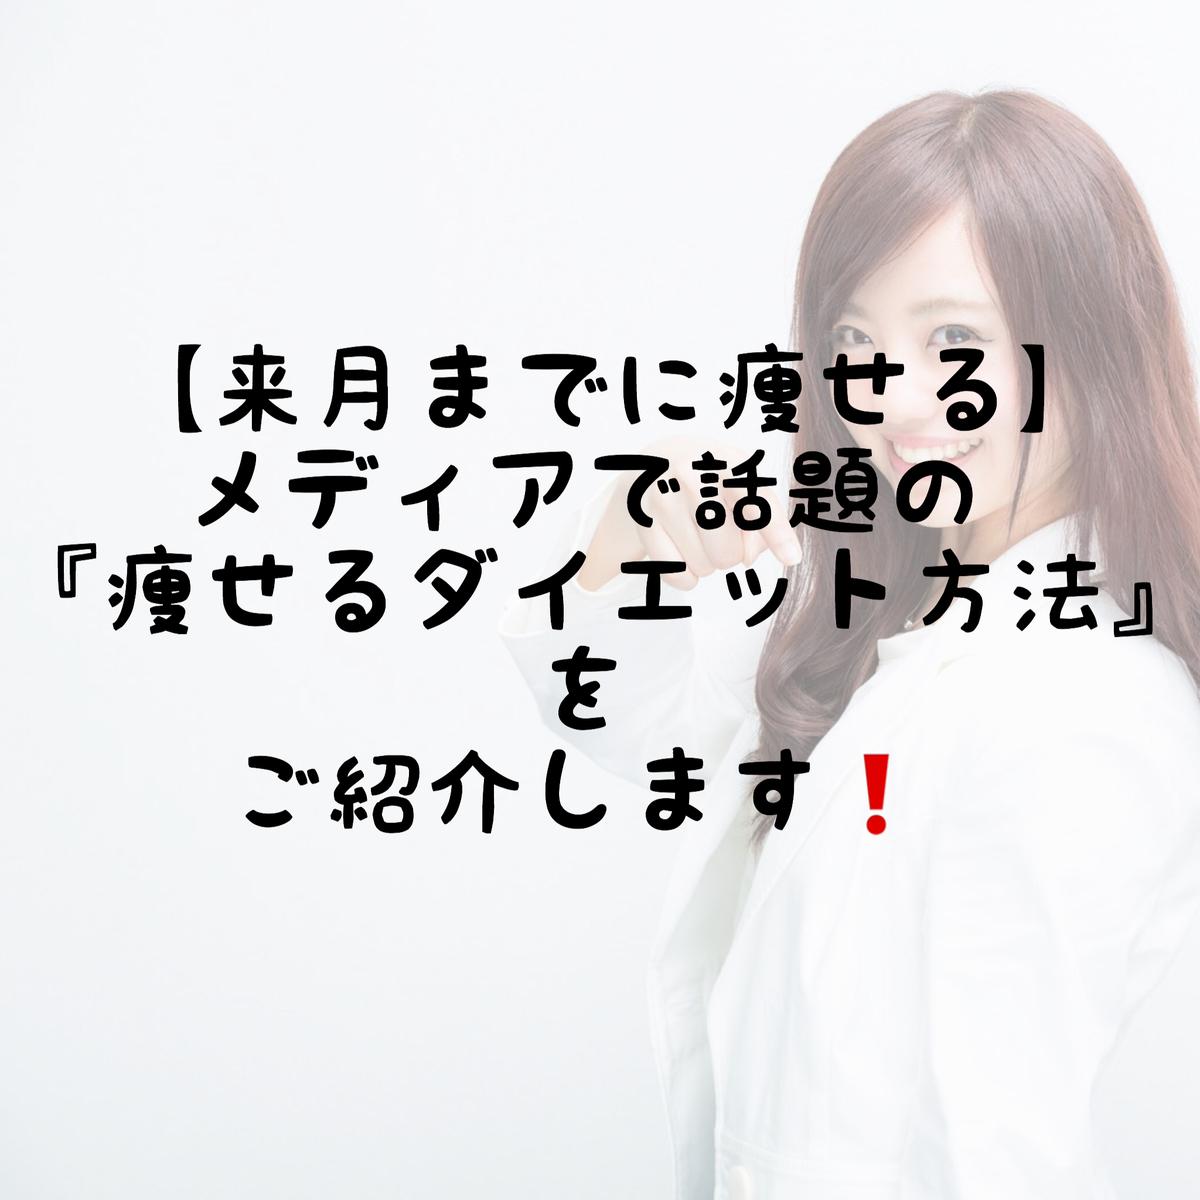 f:id:nokonoko_o:20200621200808j:plain